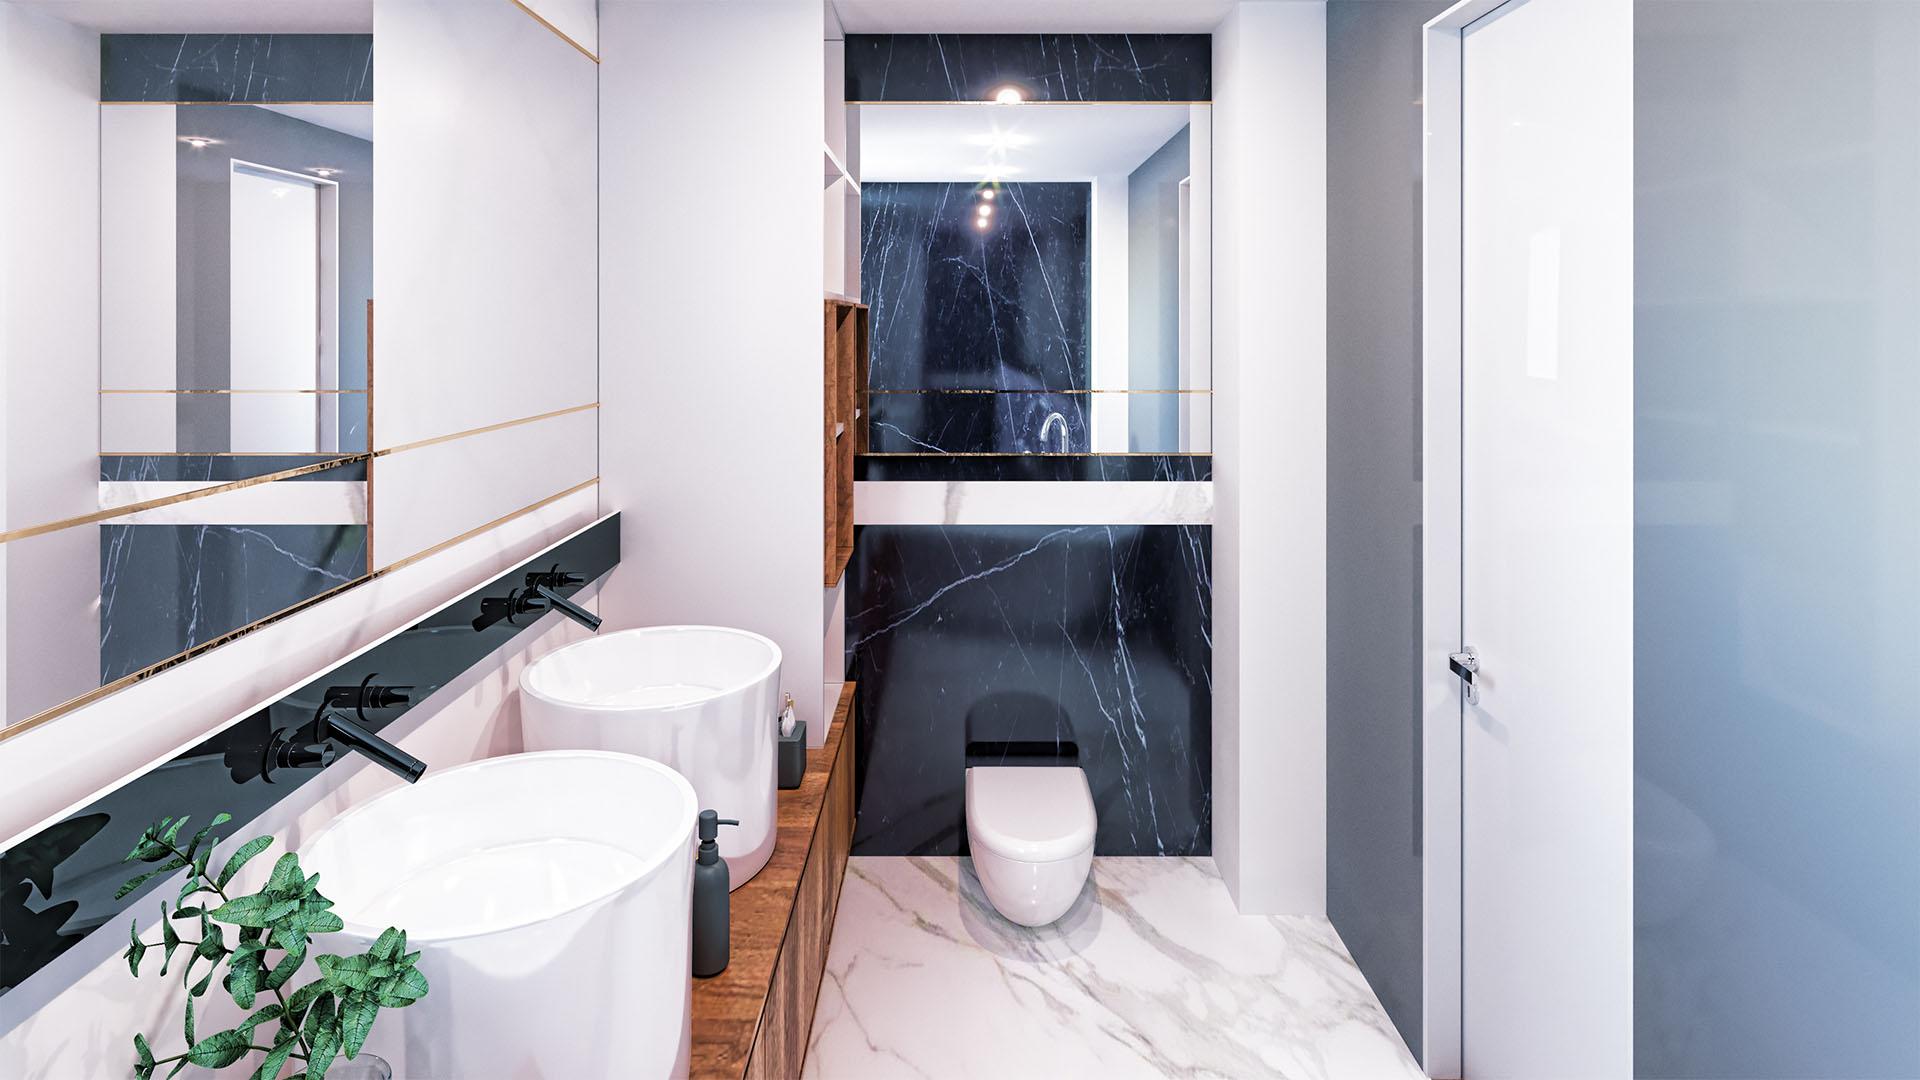 Sunset Lake Homes - propunere amenajare apartament 5